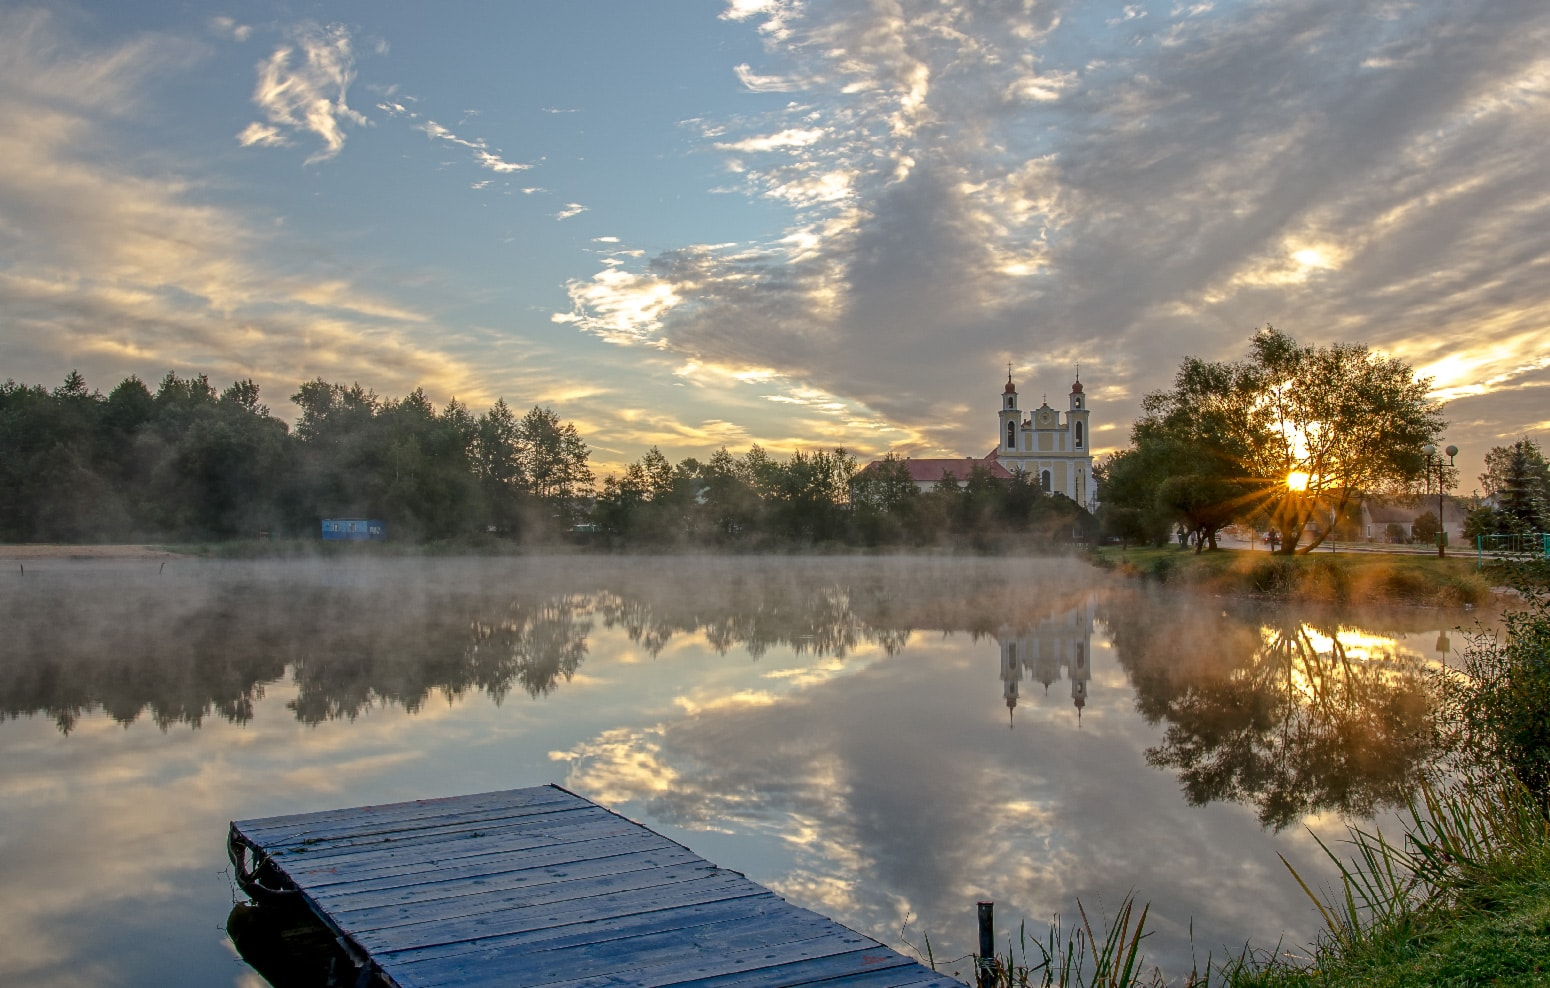 Беларусь - самая равнинная страна Европы